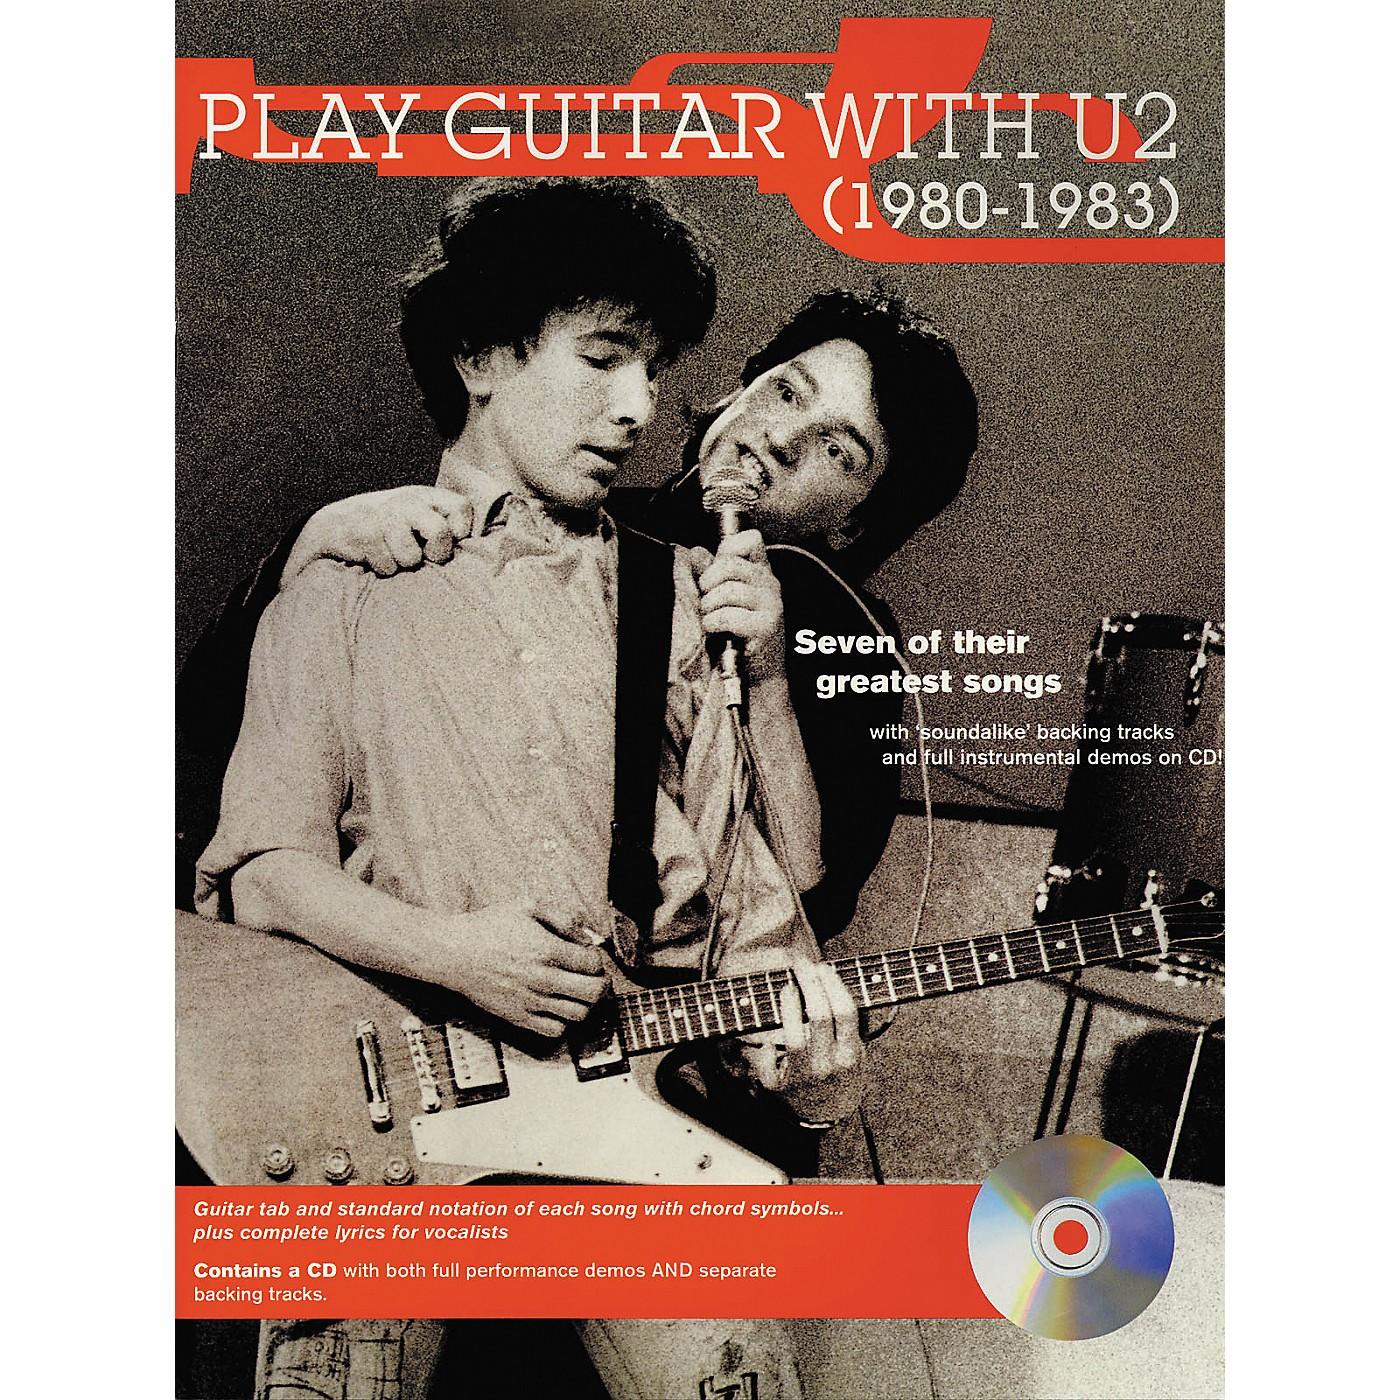 Hal Leonard Play Guitar with U2 (1980-1983) Book with CD thumbnail